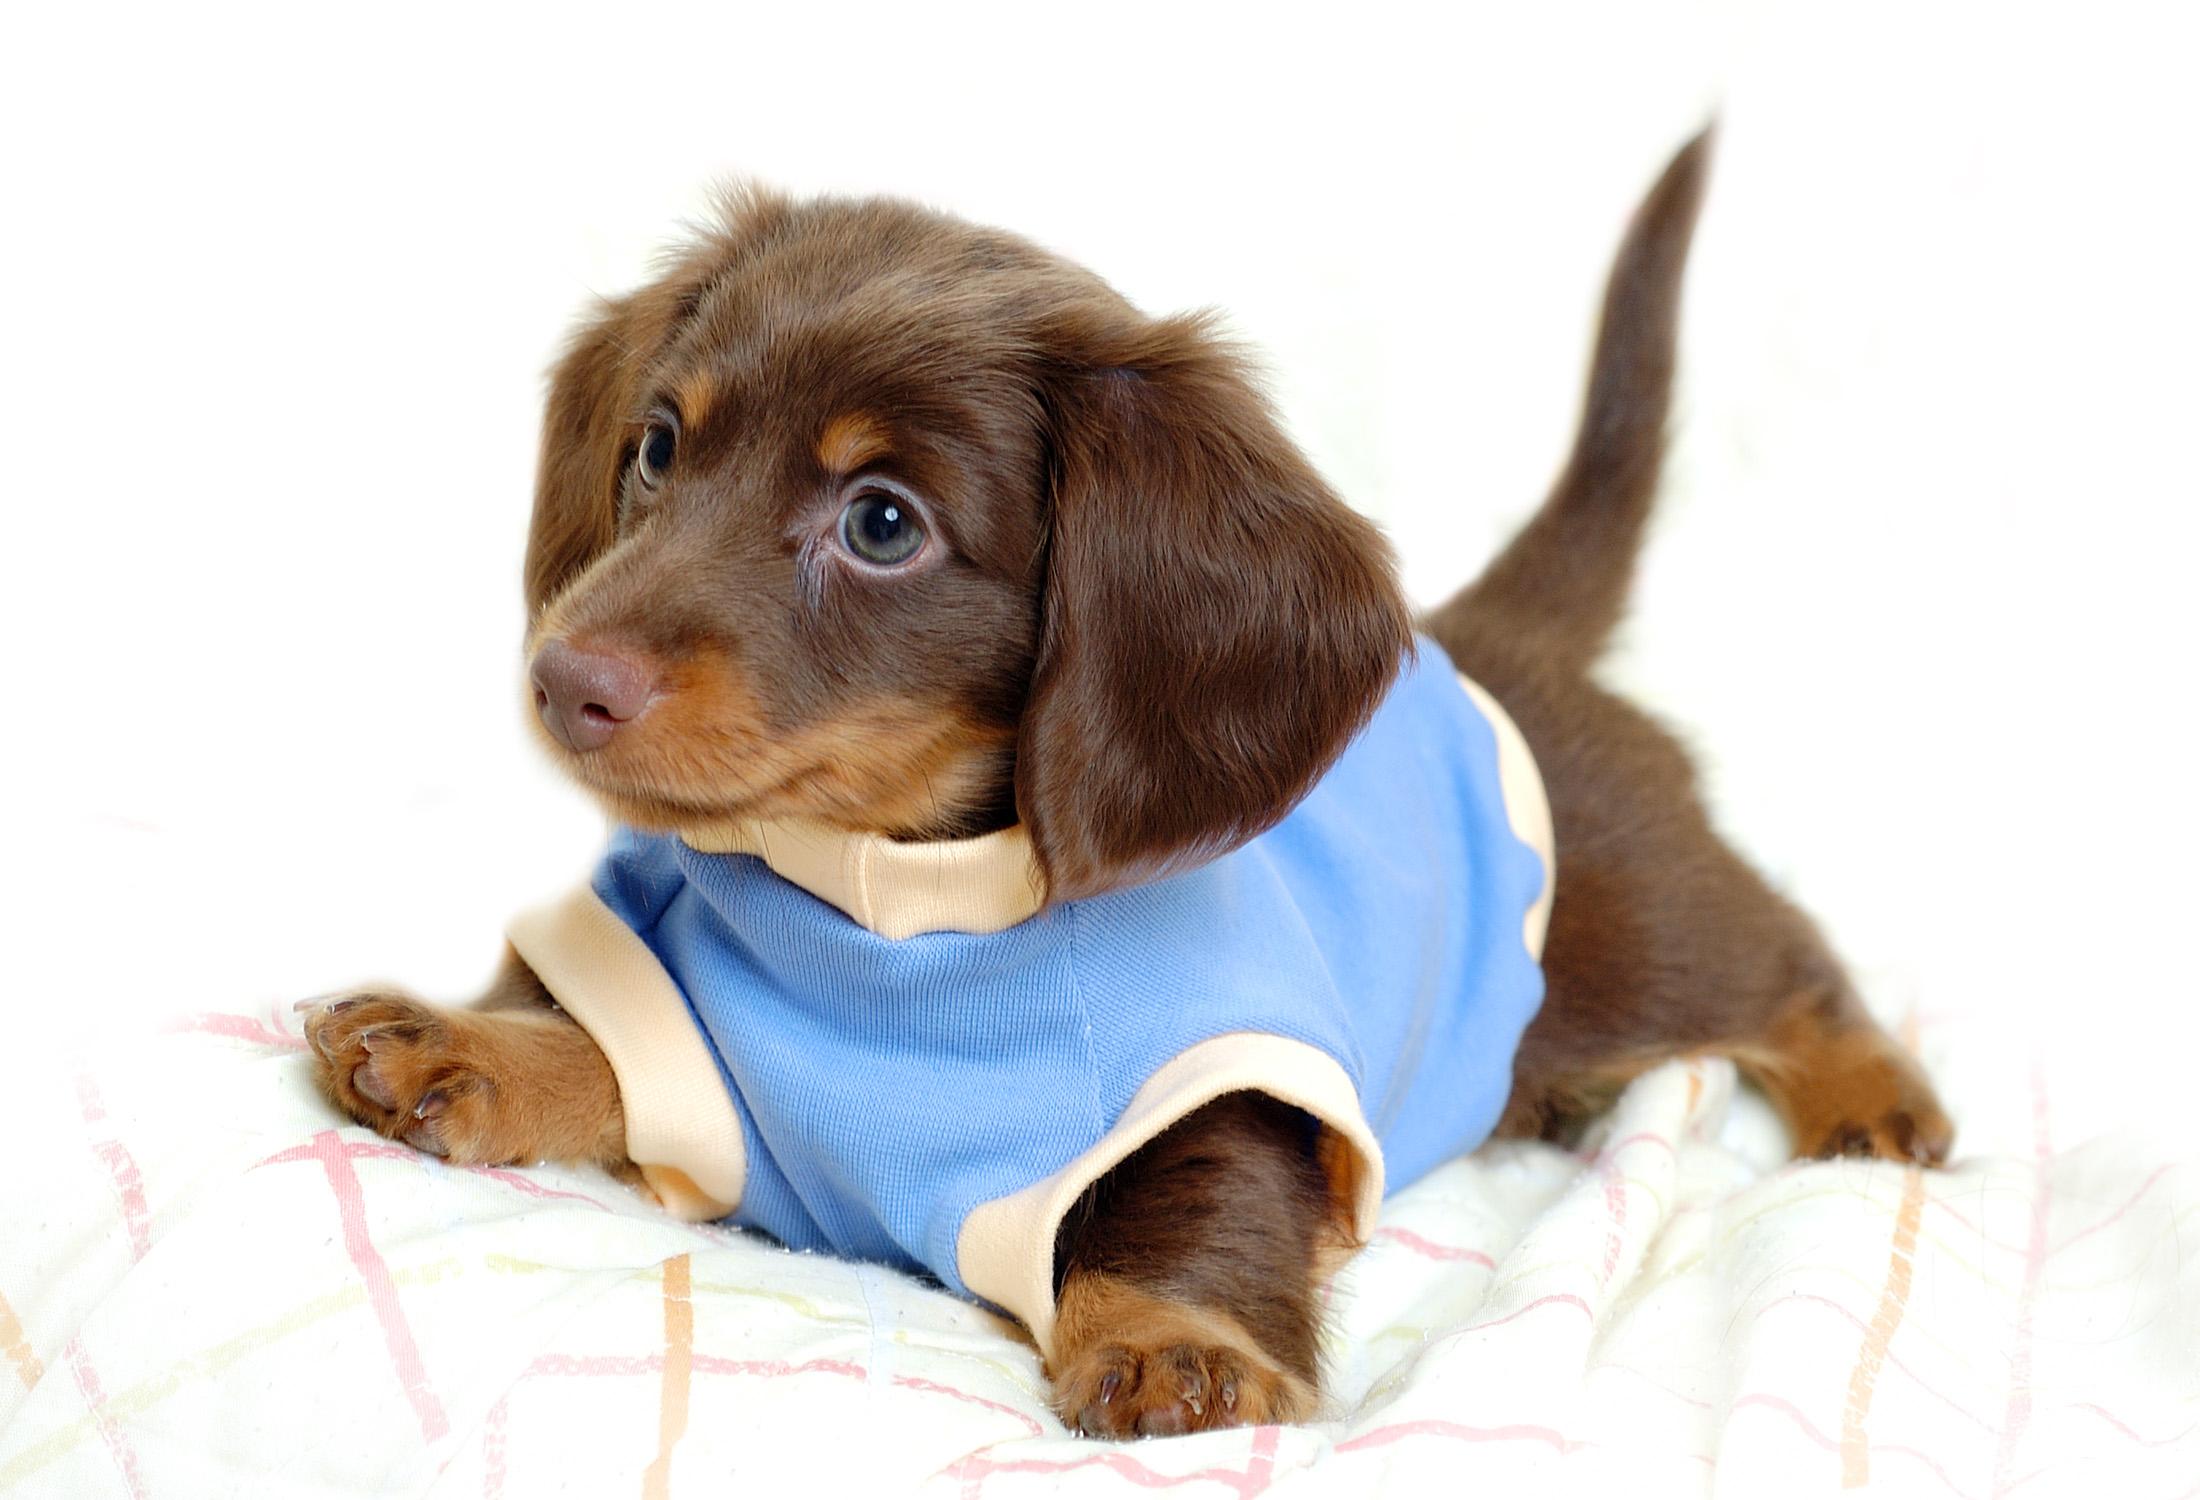 Dog Supplies  Dog Products  Dog Accessories  Dogcom